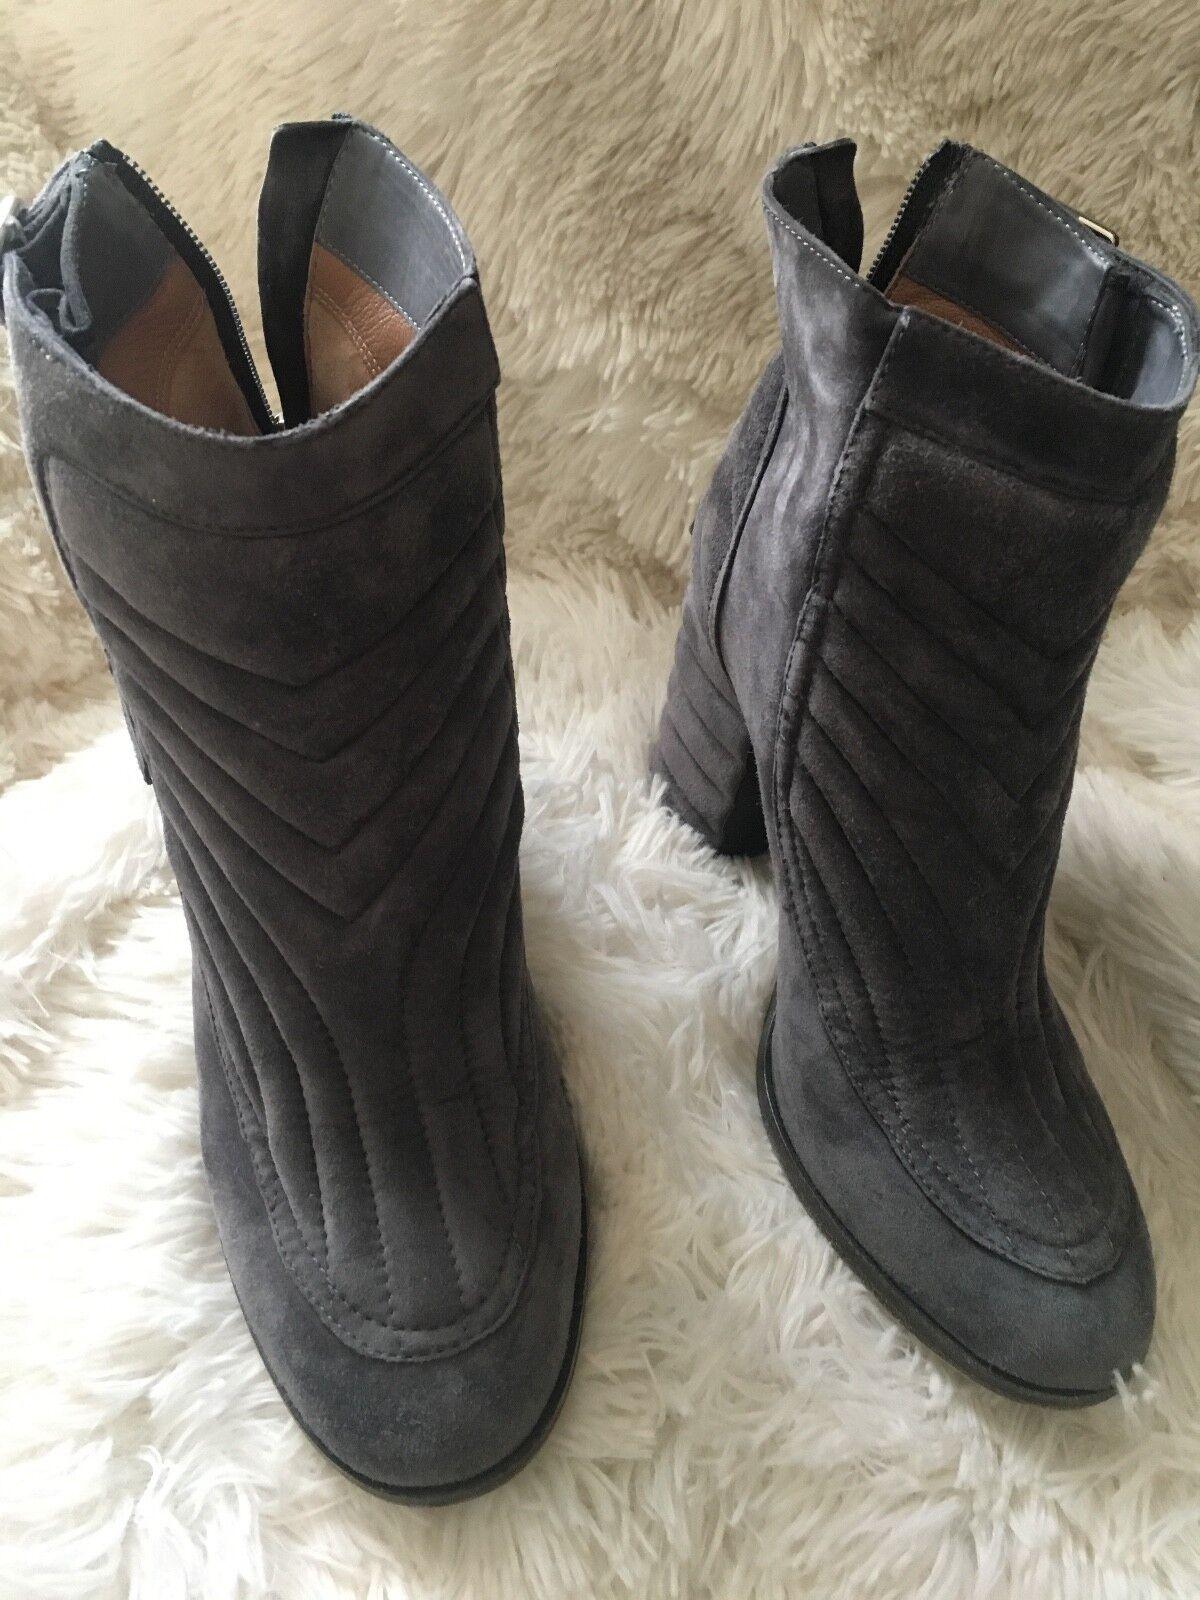 LAURENCE DACADE Barbara suede quilted boots/booties grey 38